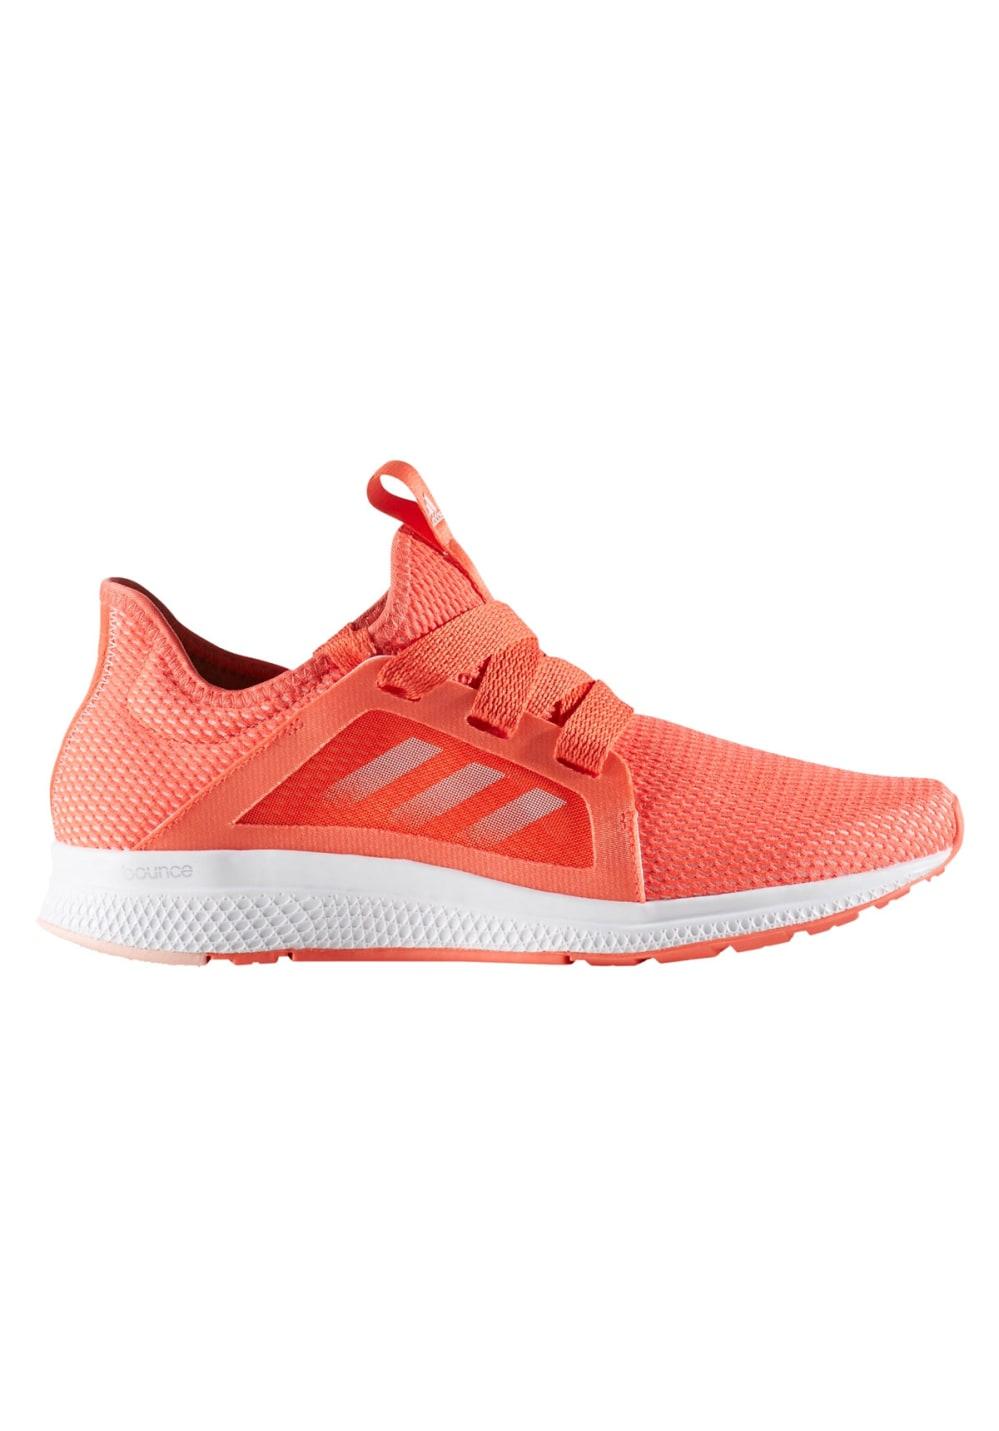 Edge 21run Orange W Femme Chaussures Adidas Pour Lux Running dZqdP8n